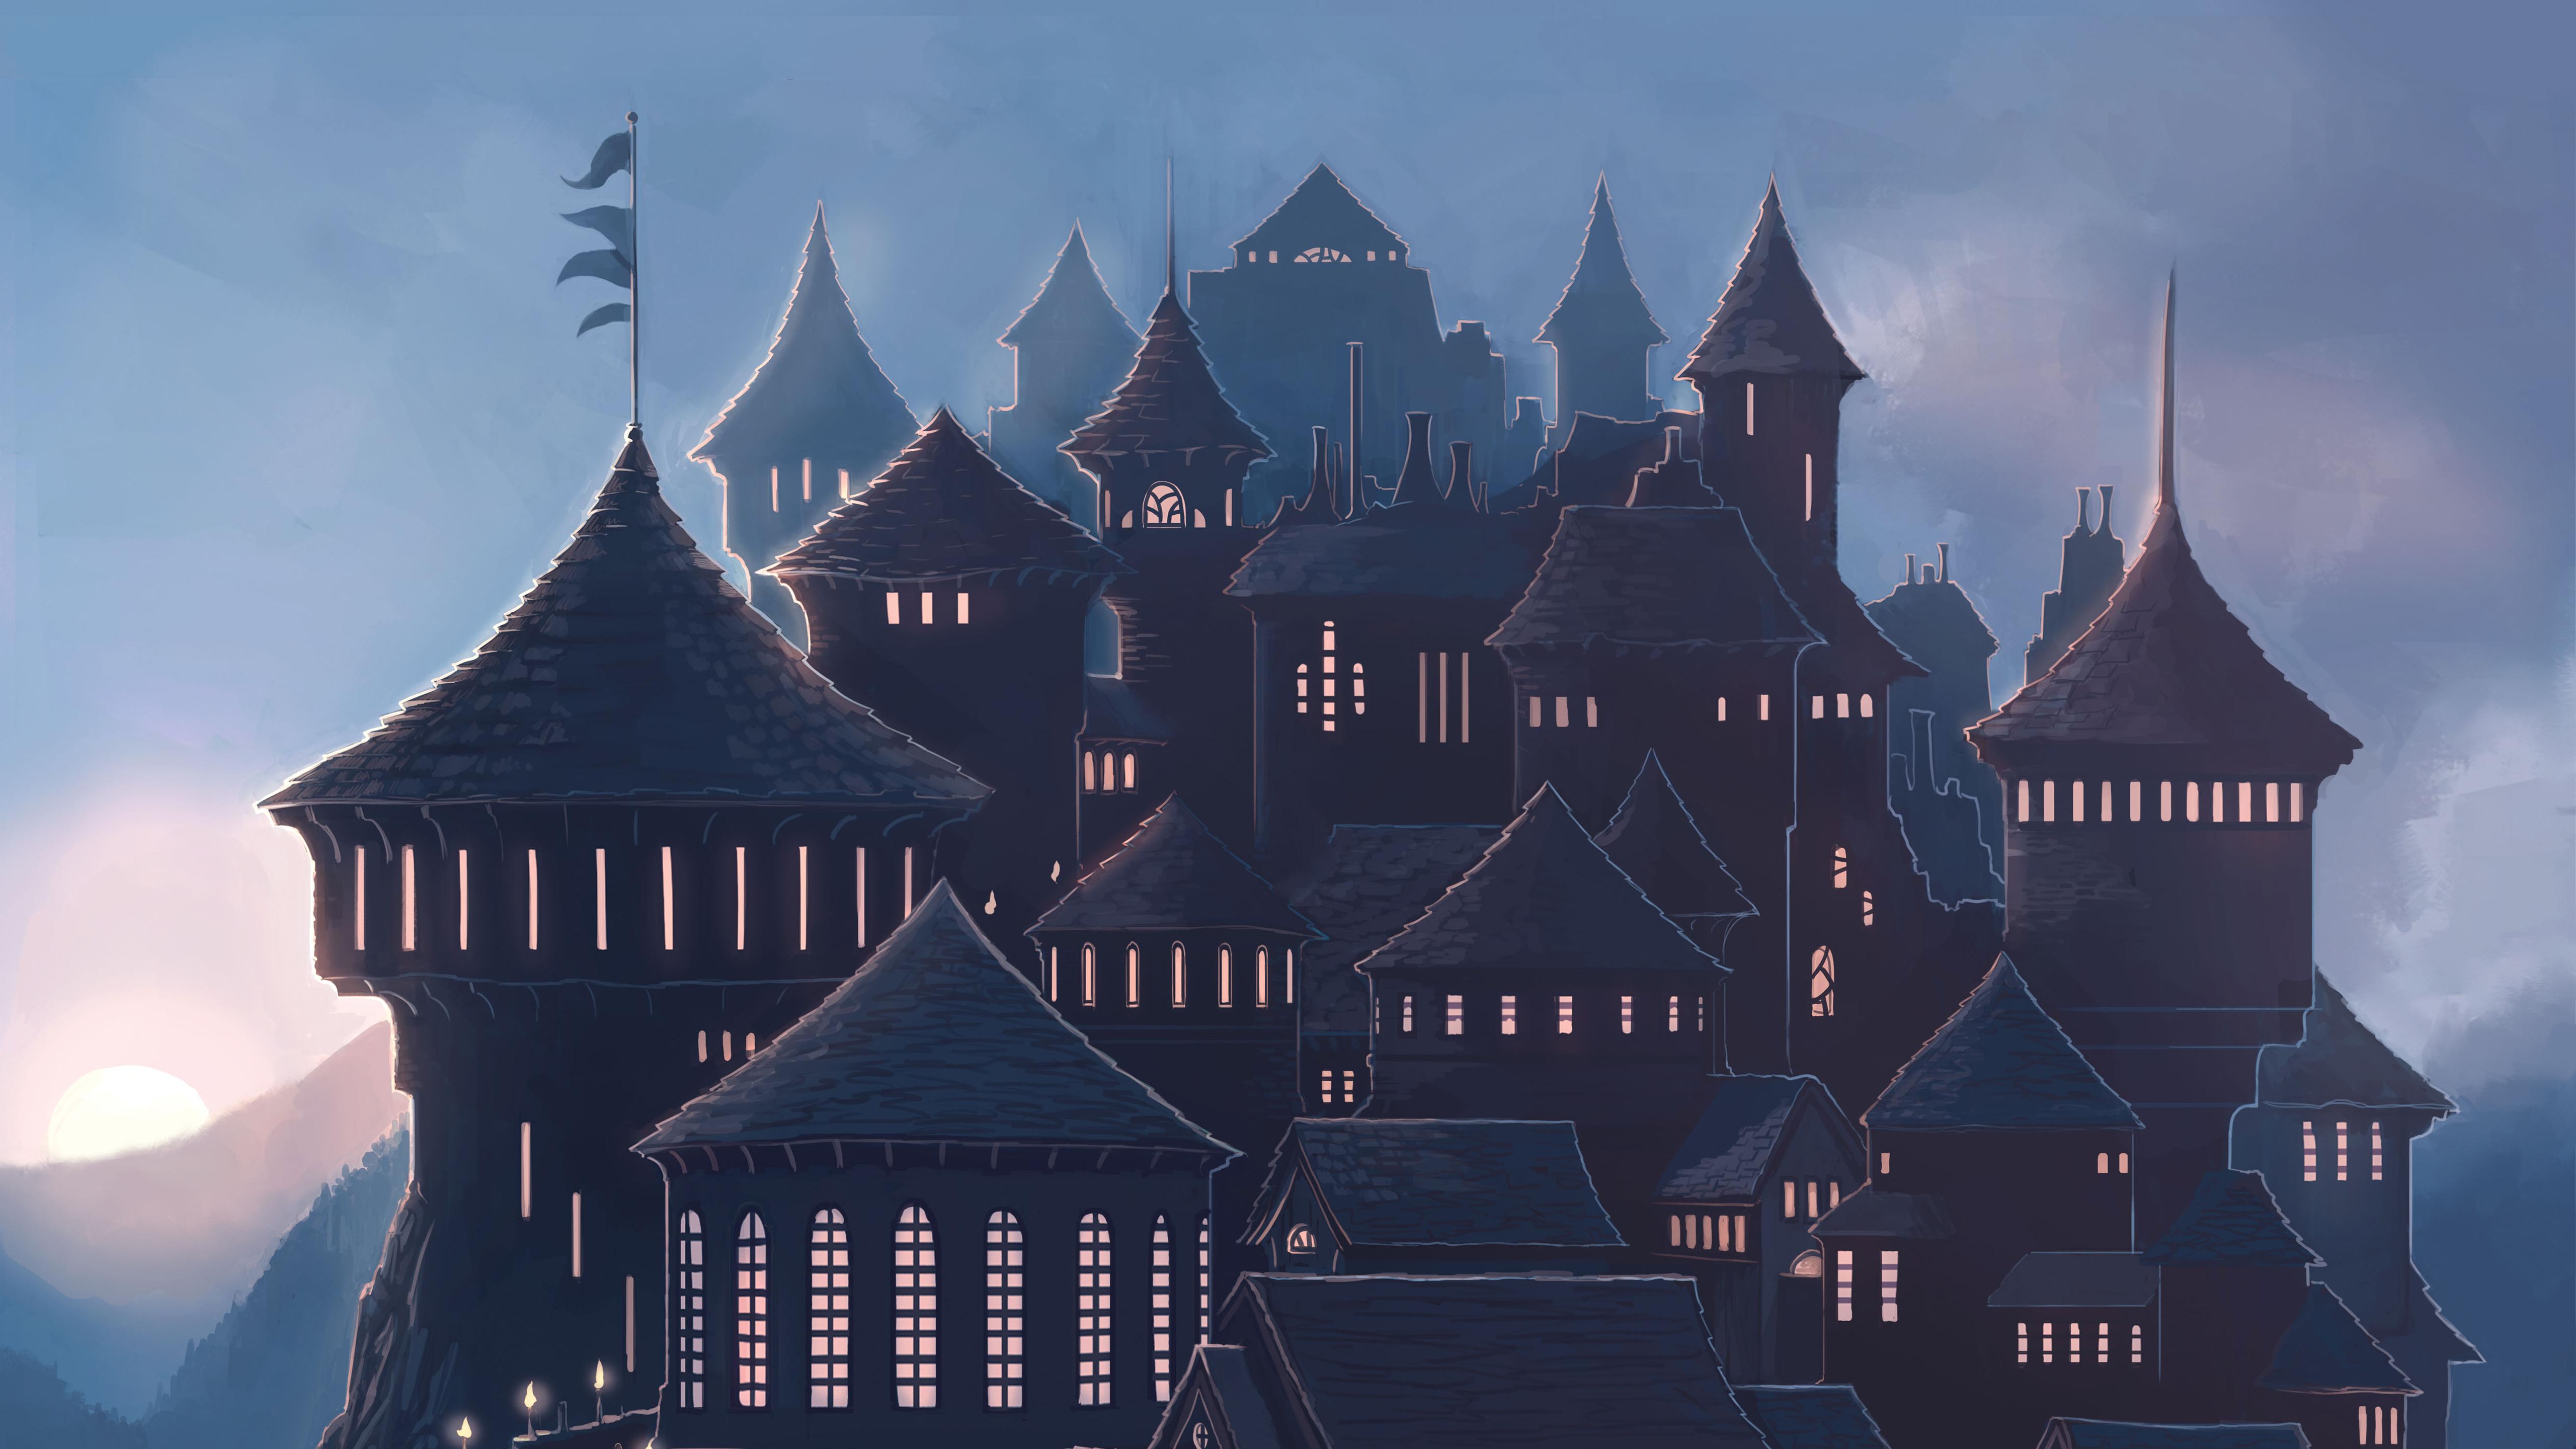 Good Wallpaper Harry Potter Android - hogwarts-harry-potter-school-5k-78  Snapshot_52151.jpg